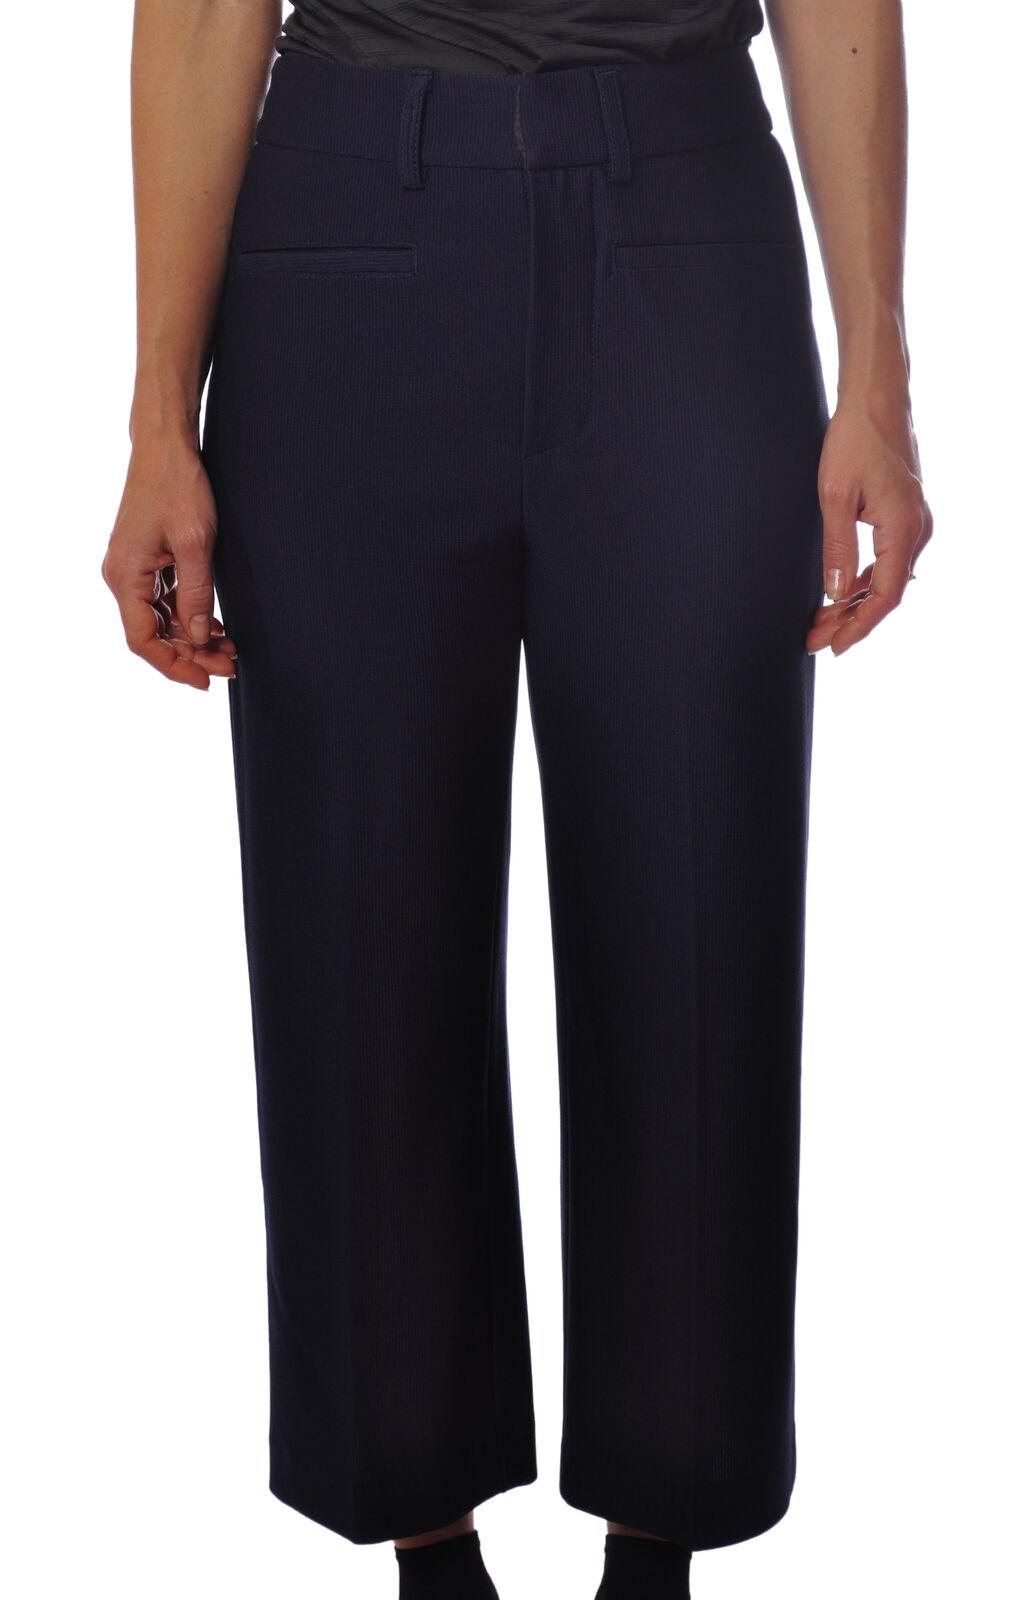 Dondup  -  Pants - Female - bluee - 2092507A183828